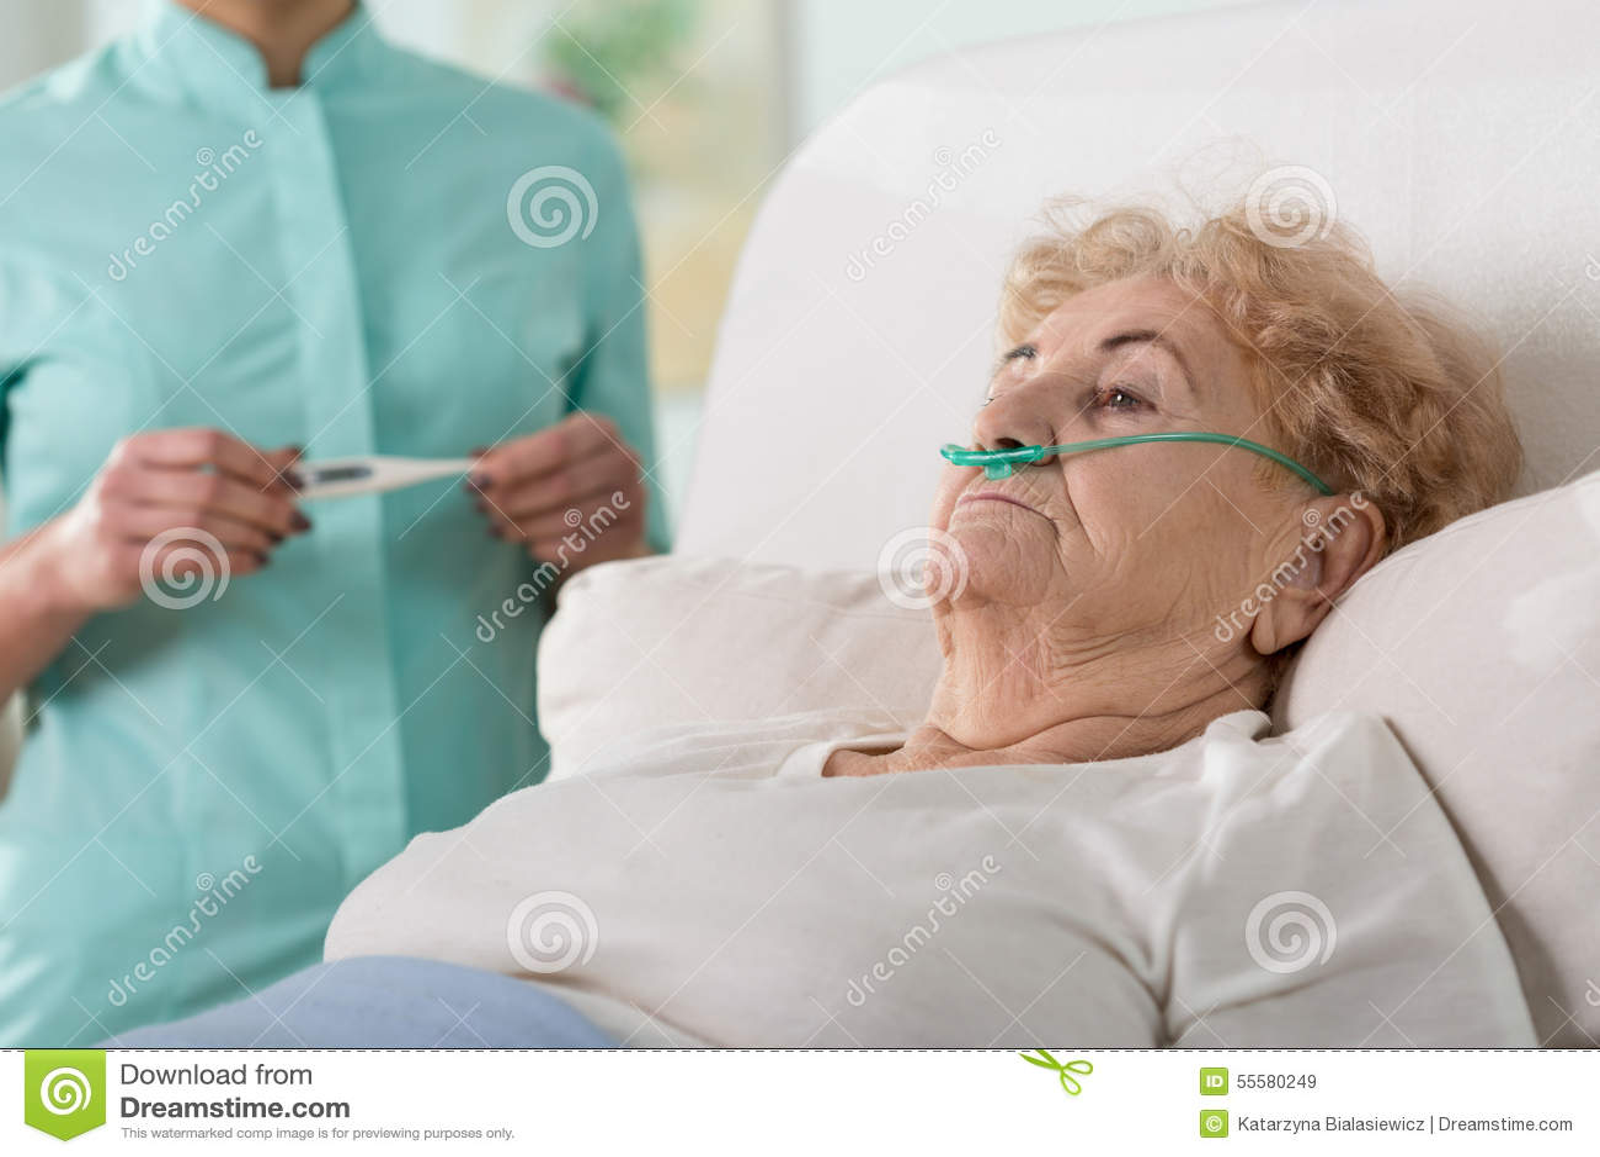 sick woman in hospital bed wwwpixsharkcom images